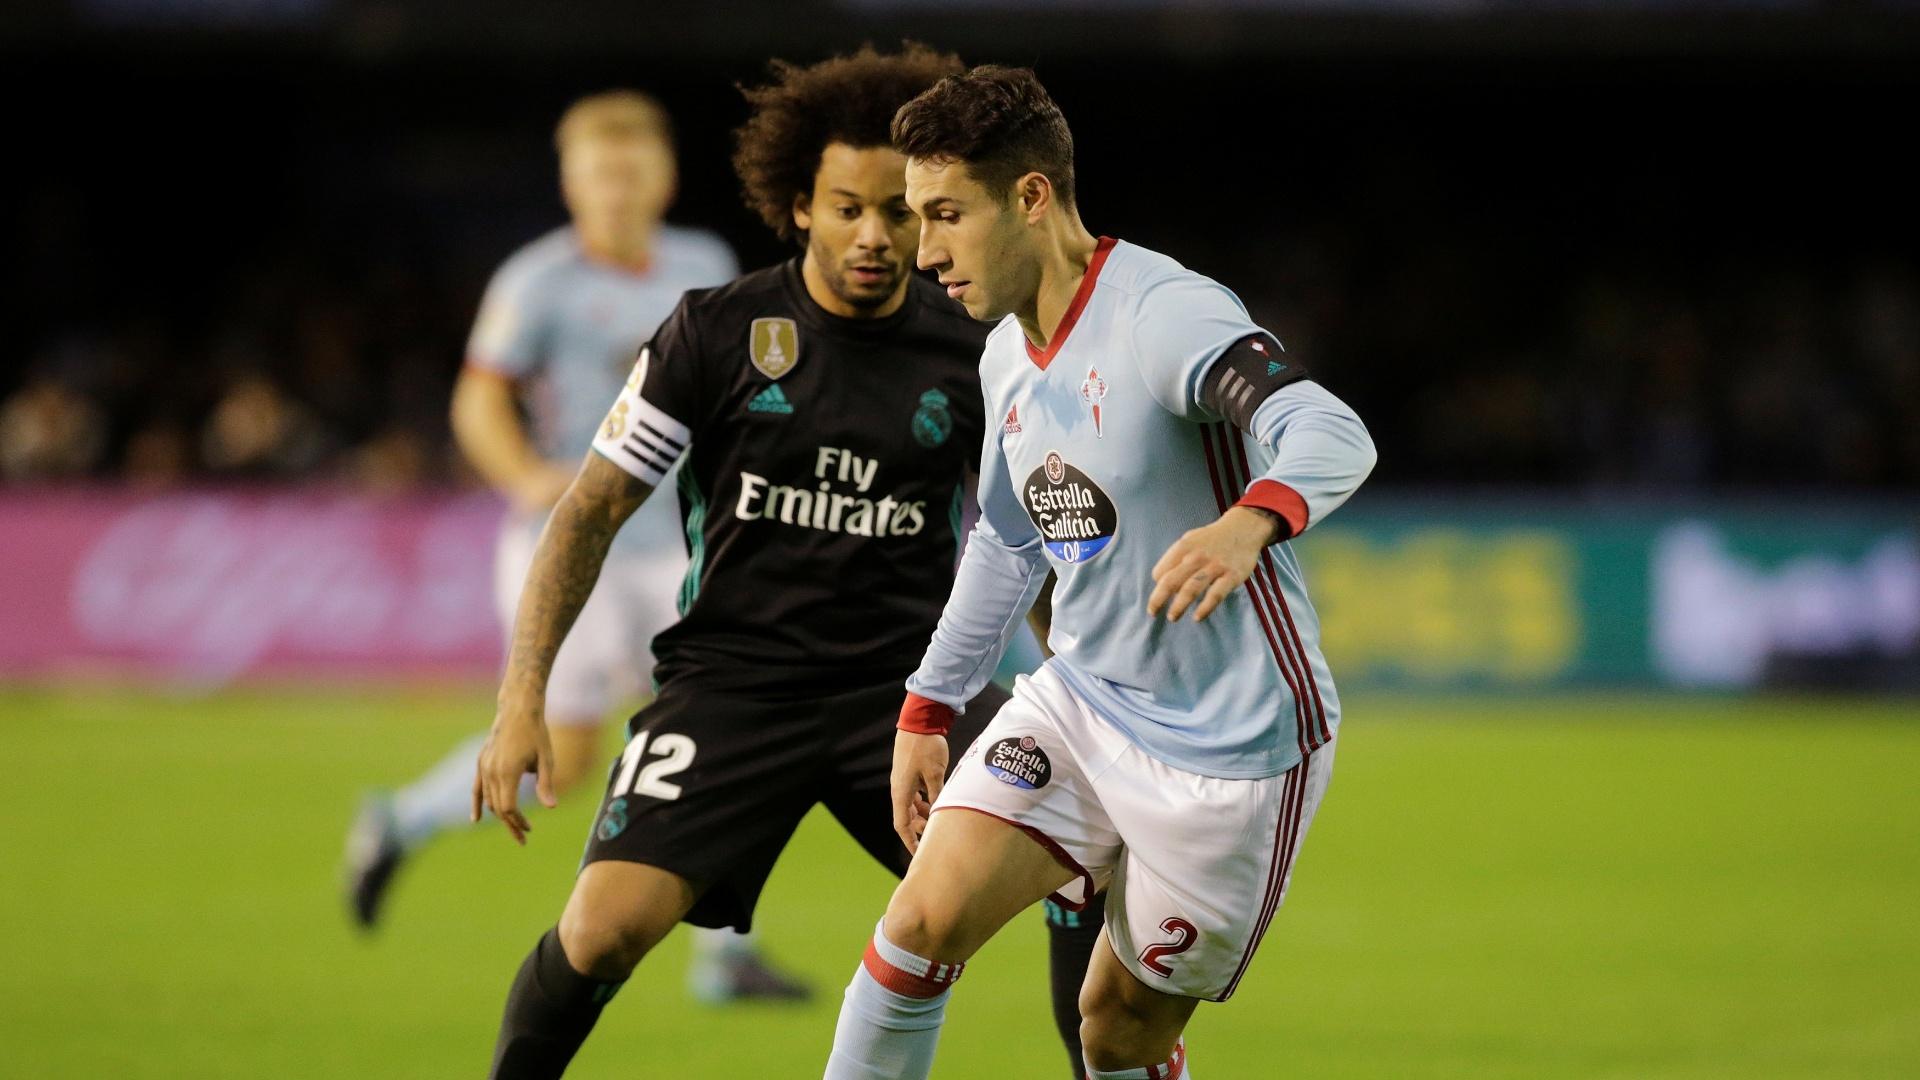 Marcelo disputando jogada na partida contra o Celta